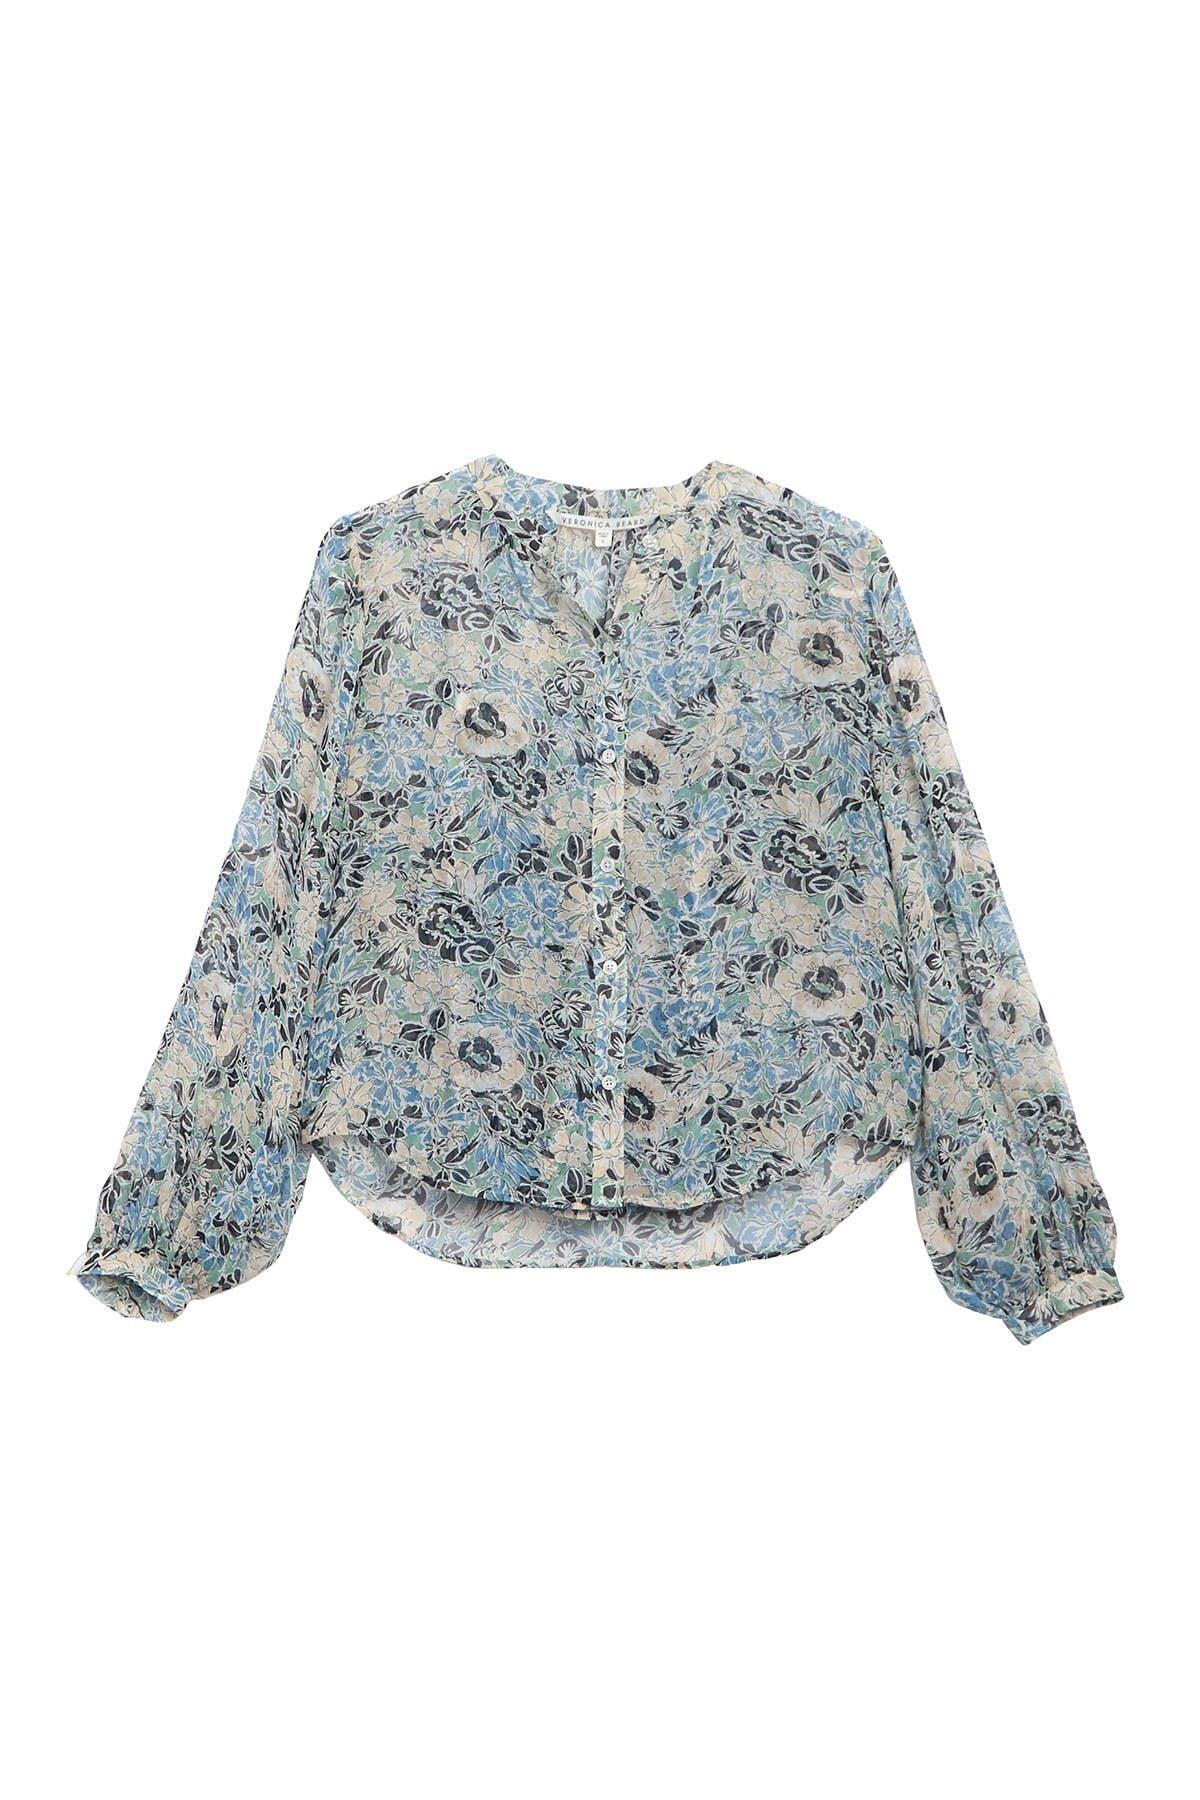 Image of VERONICA BEARD Ashlynn Floral Print Silk Blouse